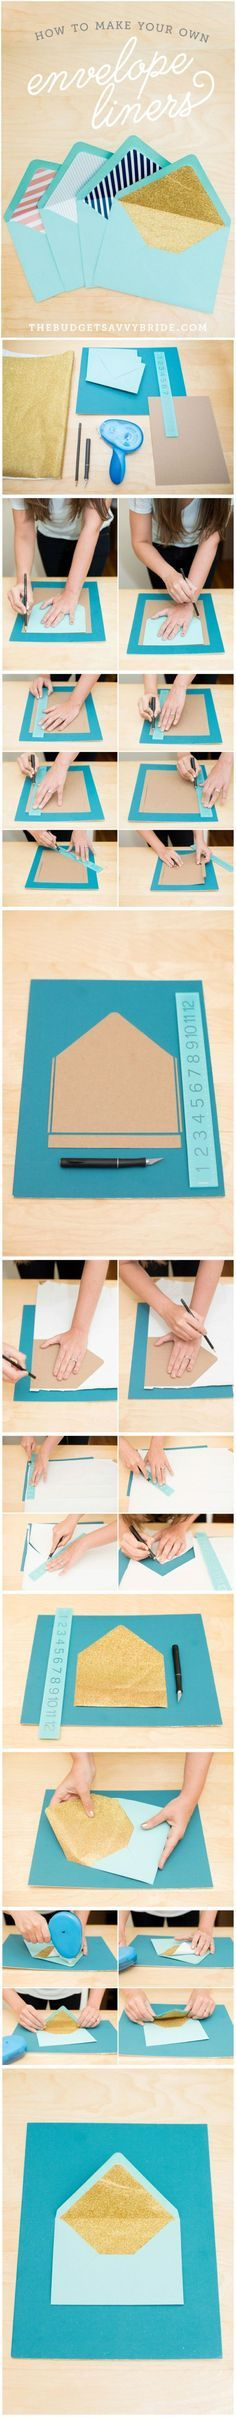 Line 'em up, send 'em out! #DIY envelope liners make any correspondence special.